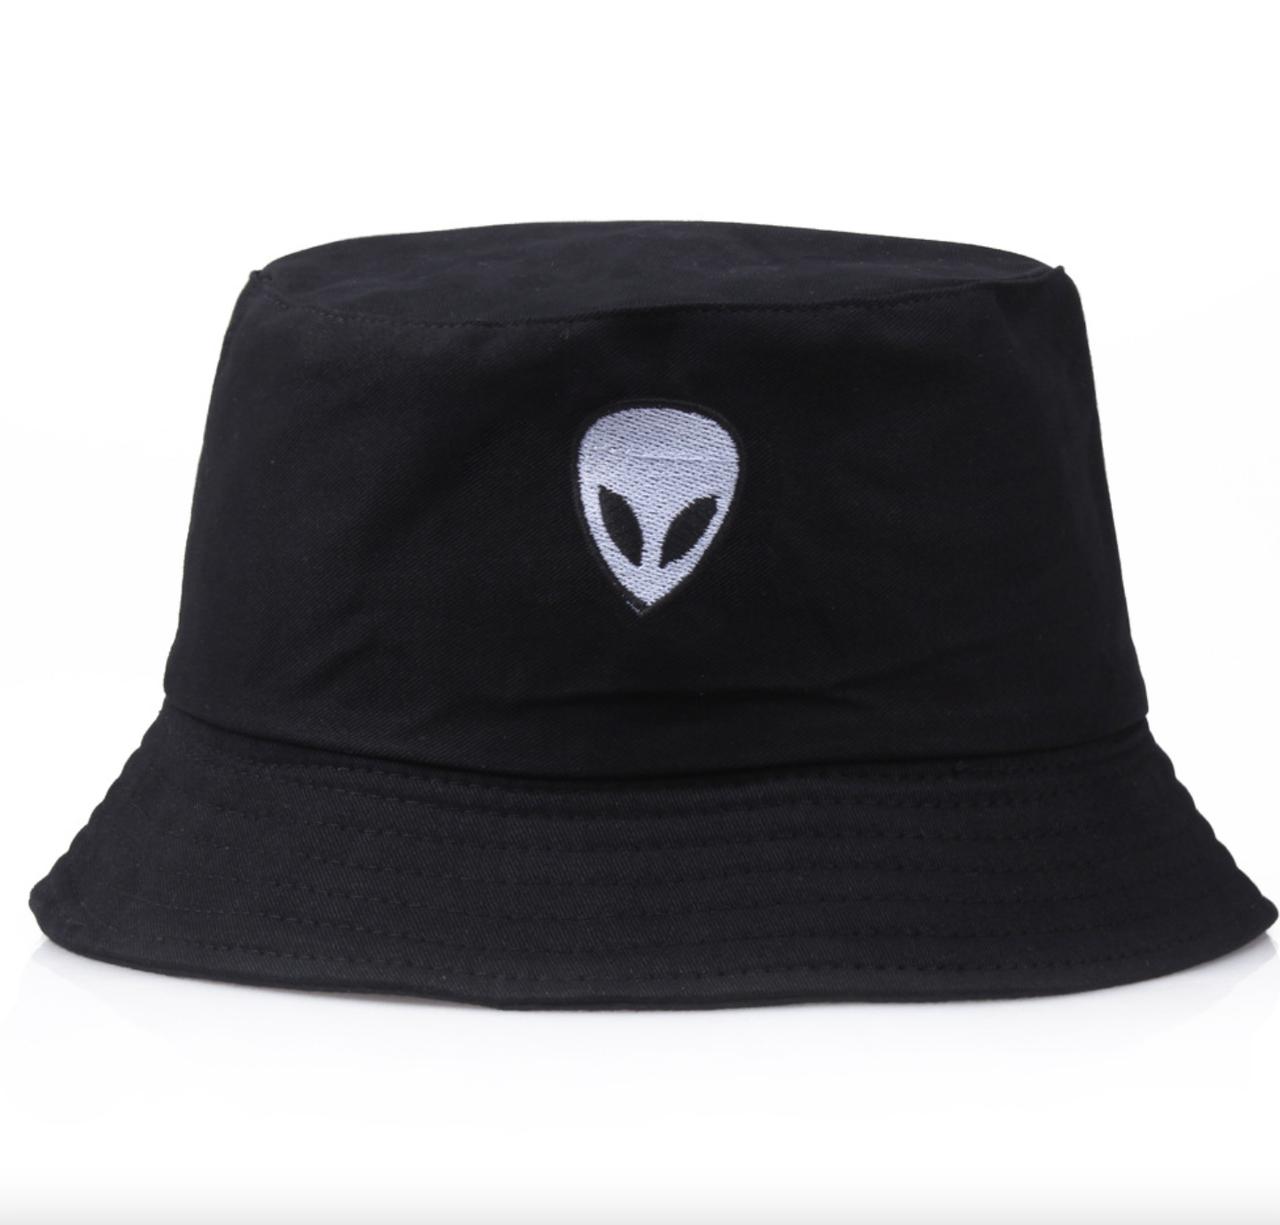 Панама Bucket Hat City-A Alien Інопланетянин Чорна